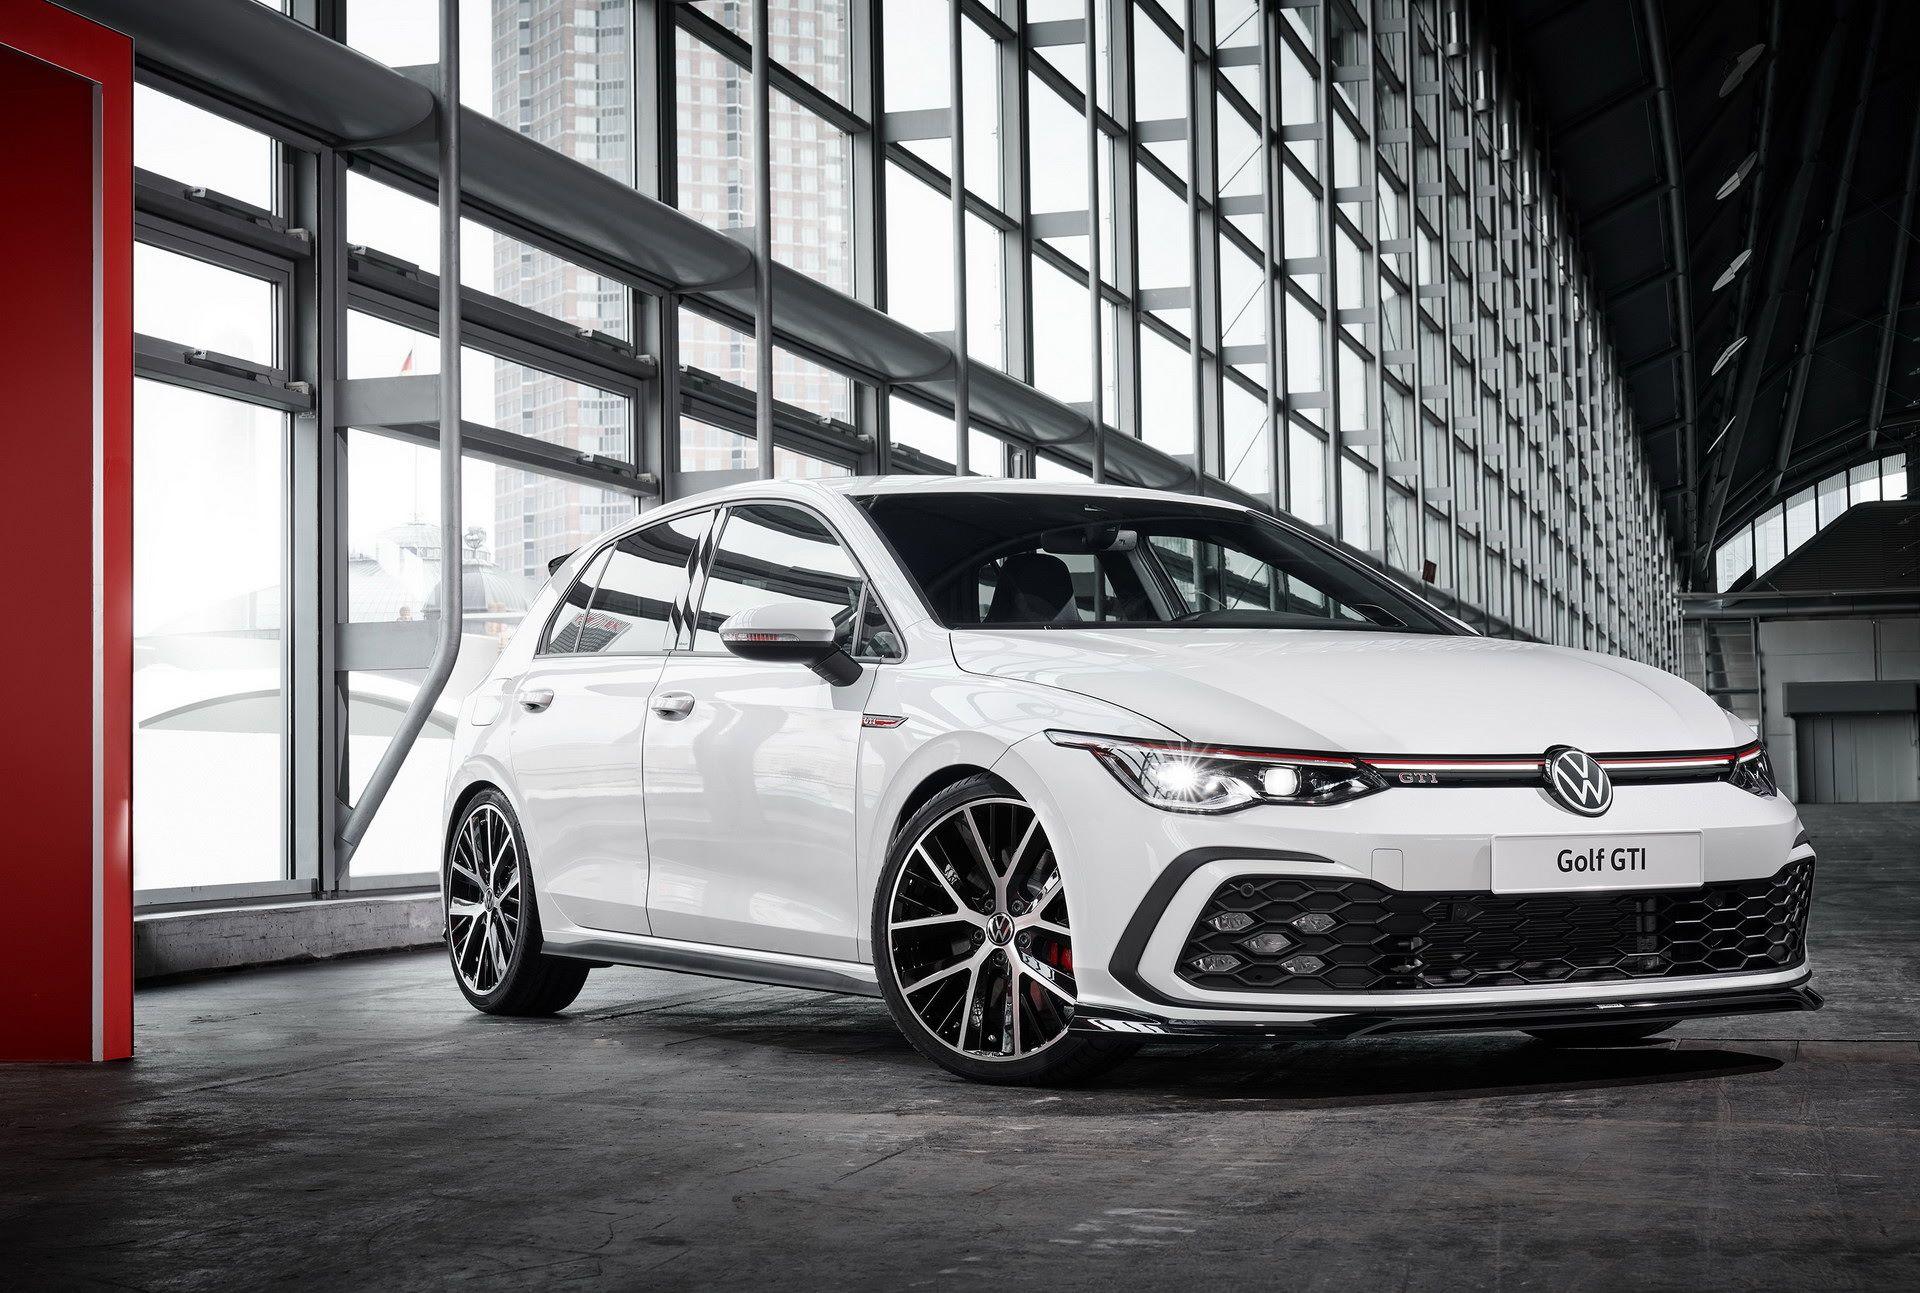 VW-Golf-GTI-By-Oettinger-1